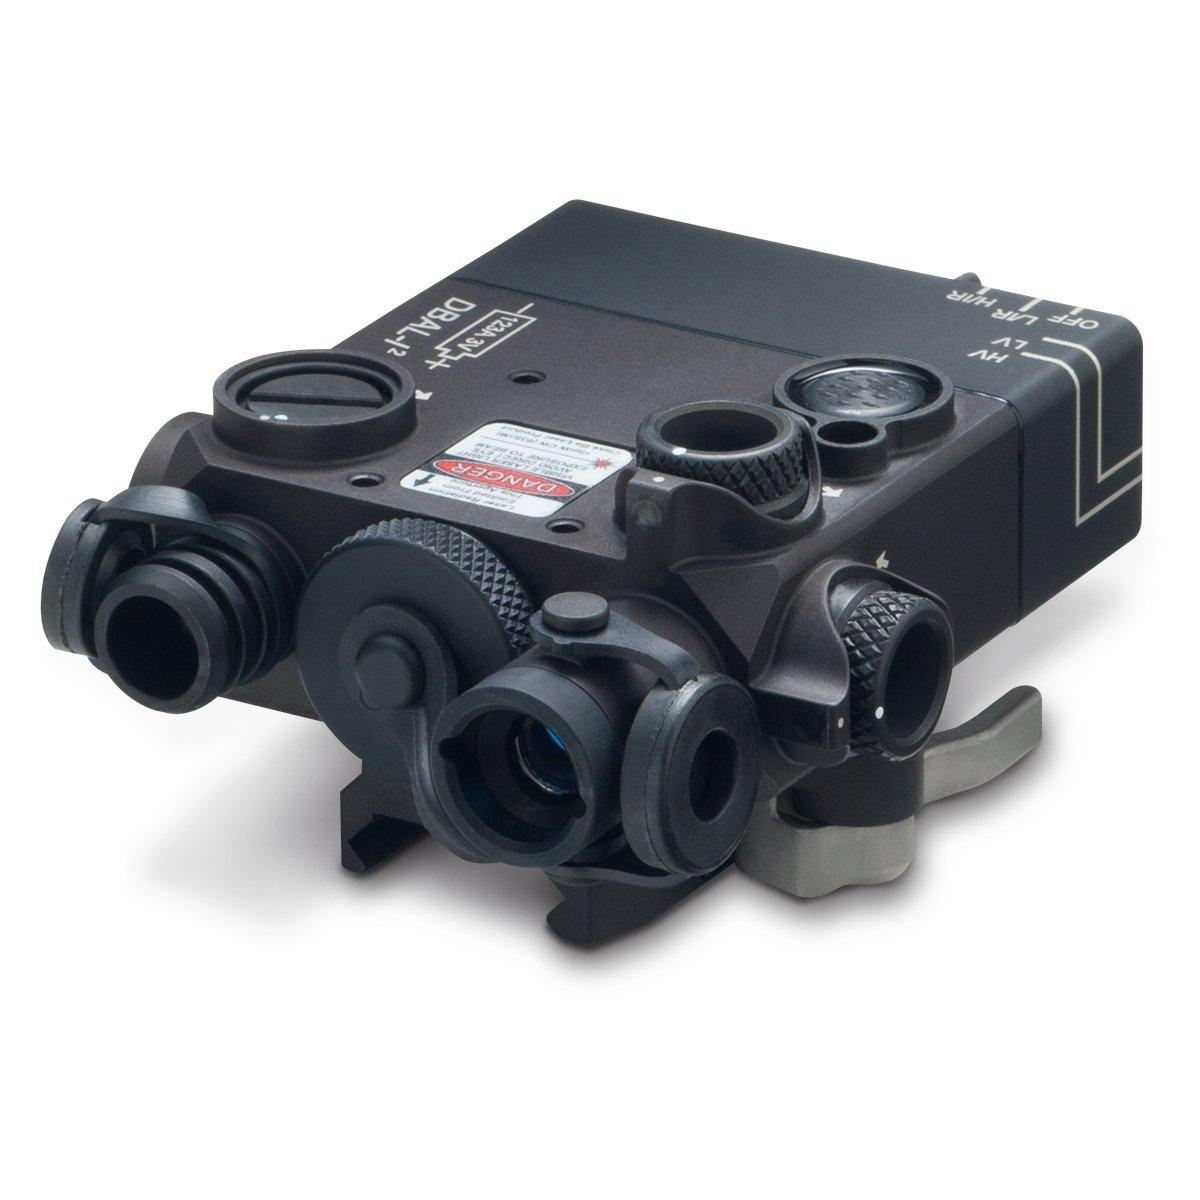 Steiner eOptics DBAL-I2 Dual Beam Aiming Laser Intelligent (Red Laser), Black